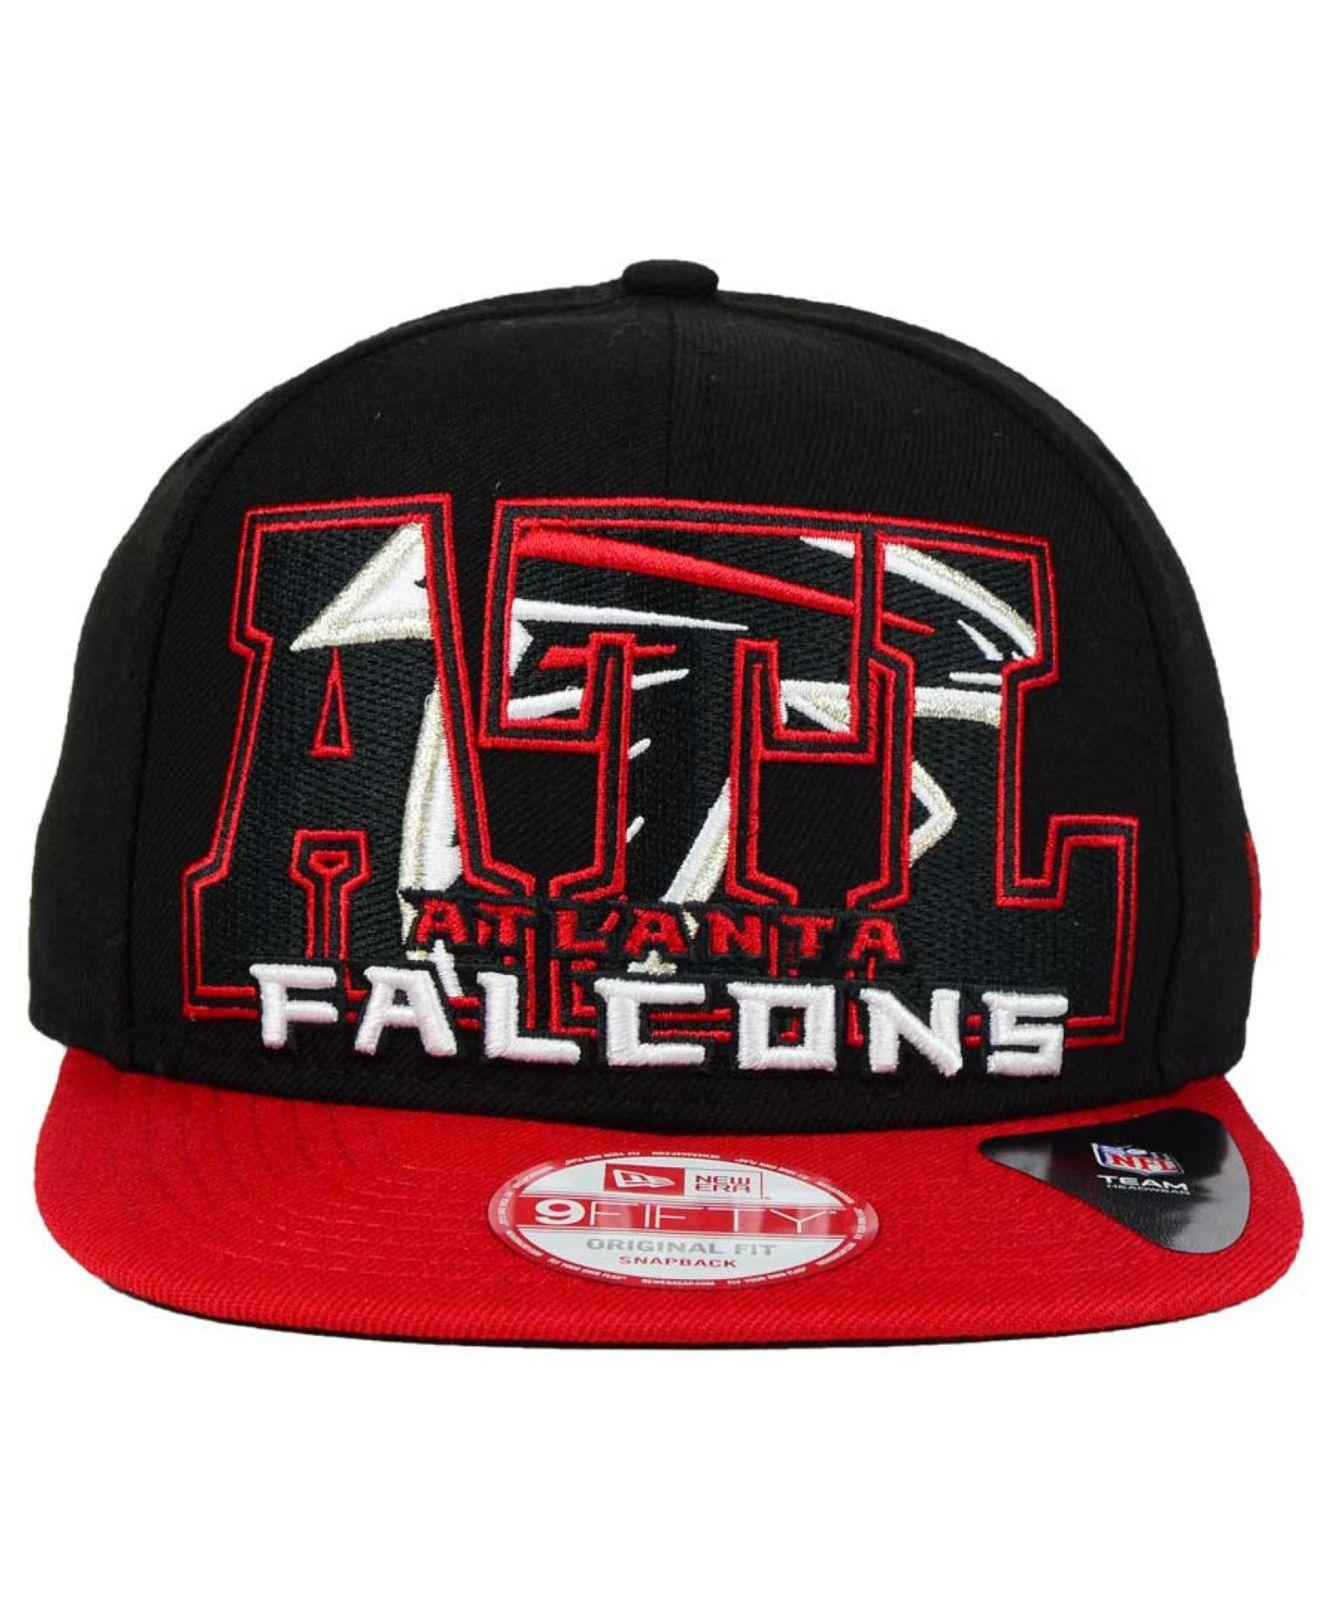 Lyst Ktz Atlanta Falcons Big City 9fifty Snapback Cap In Black For Men e3ebf4aaaa82